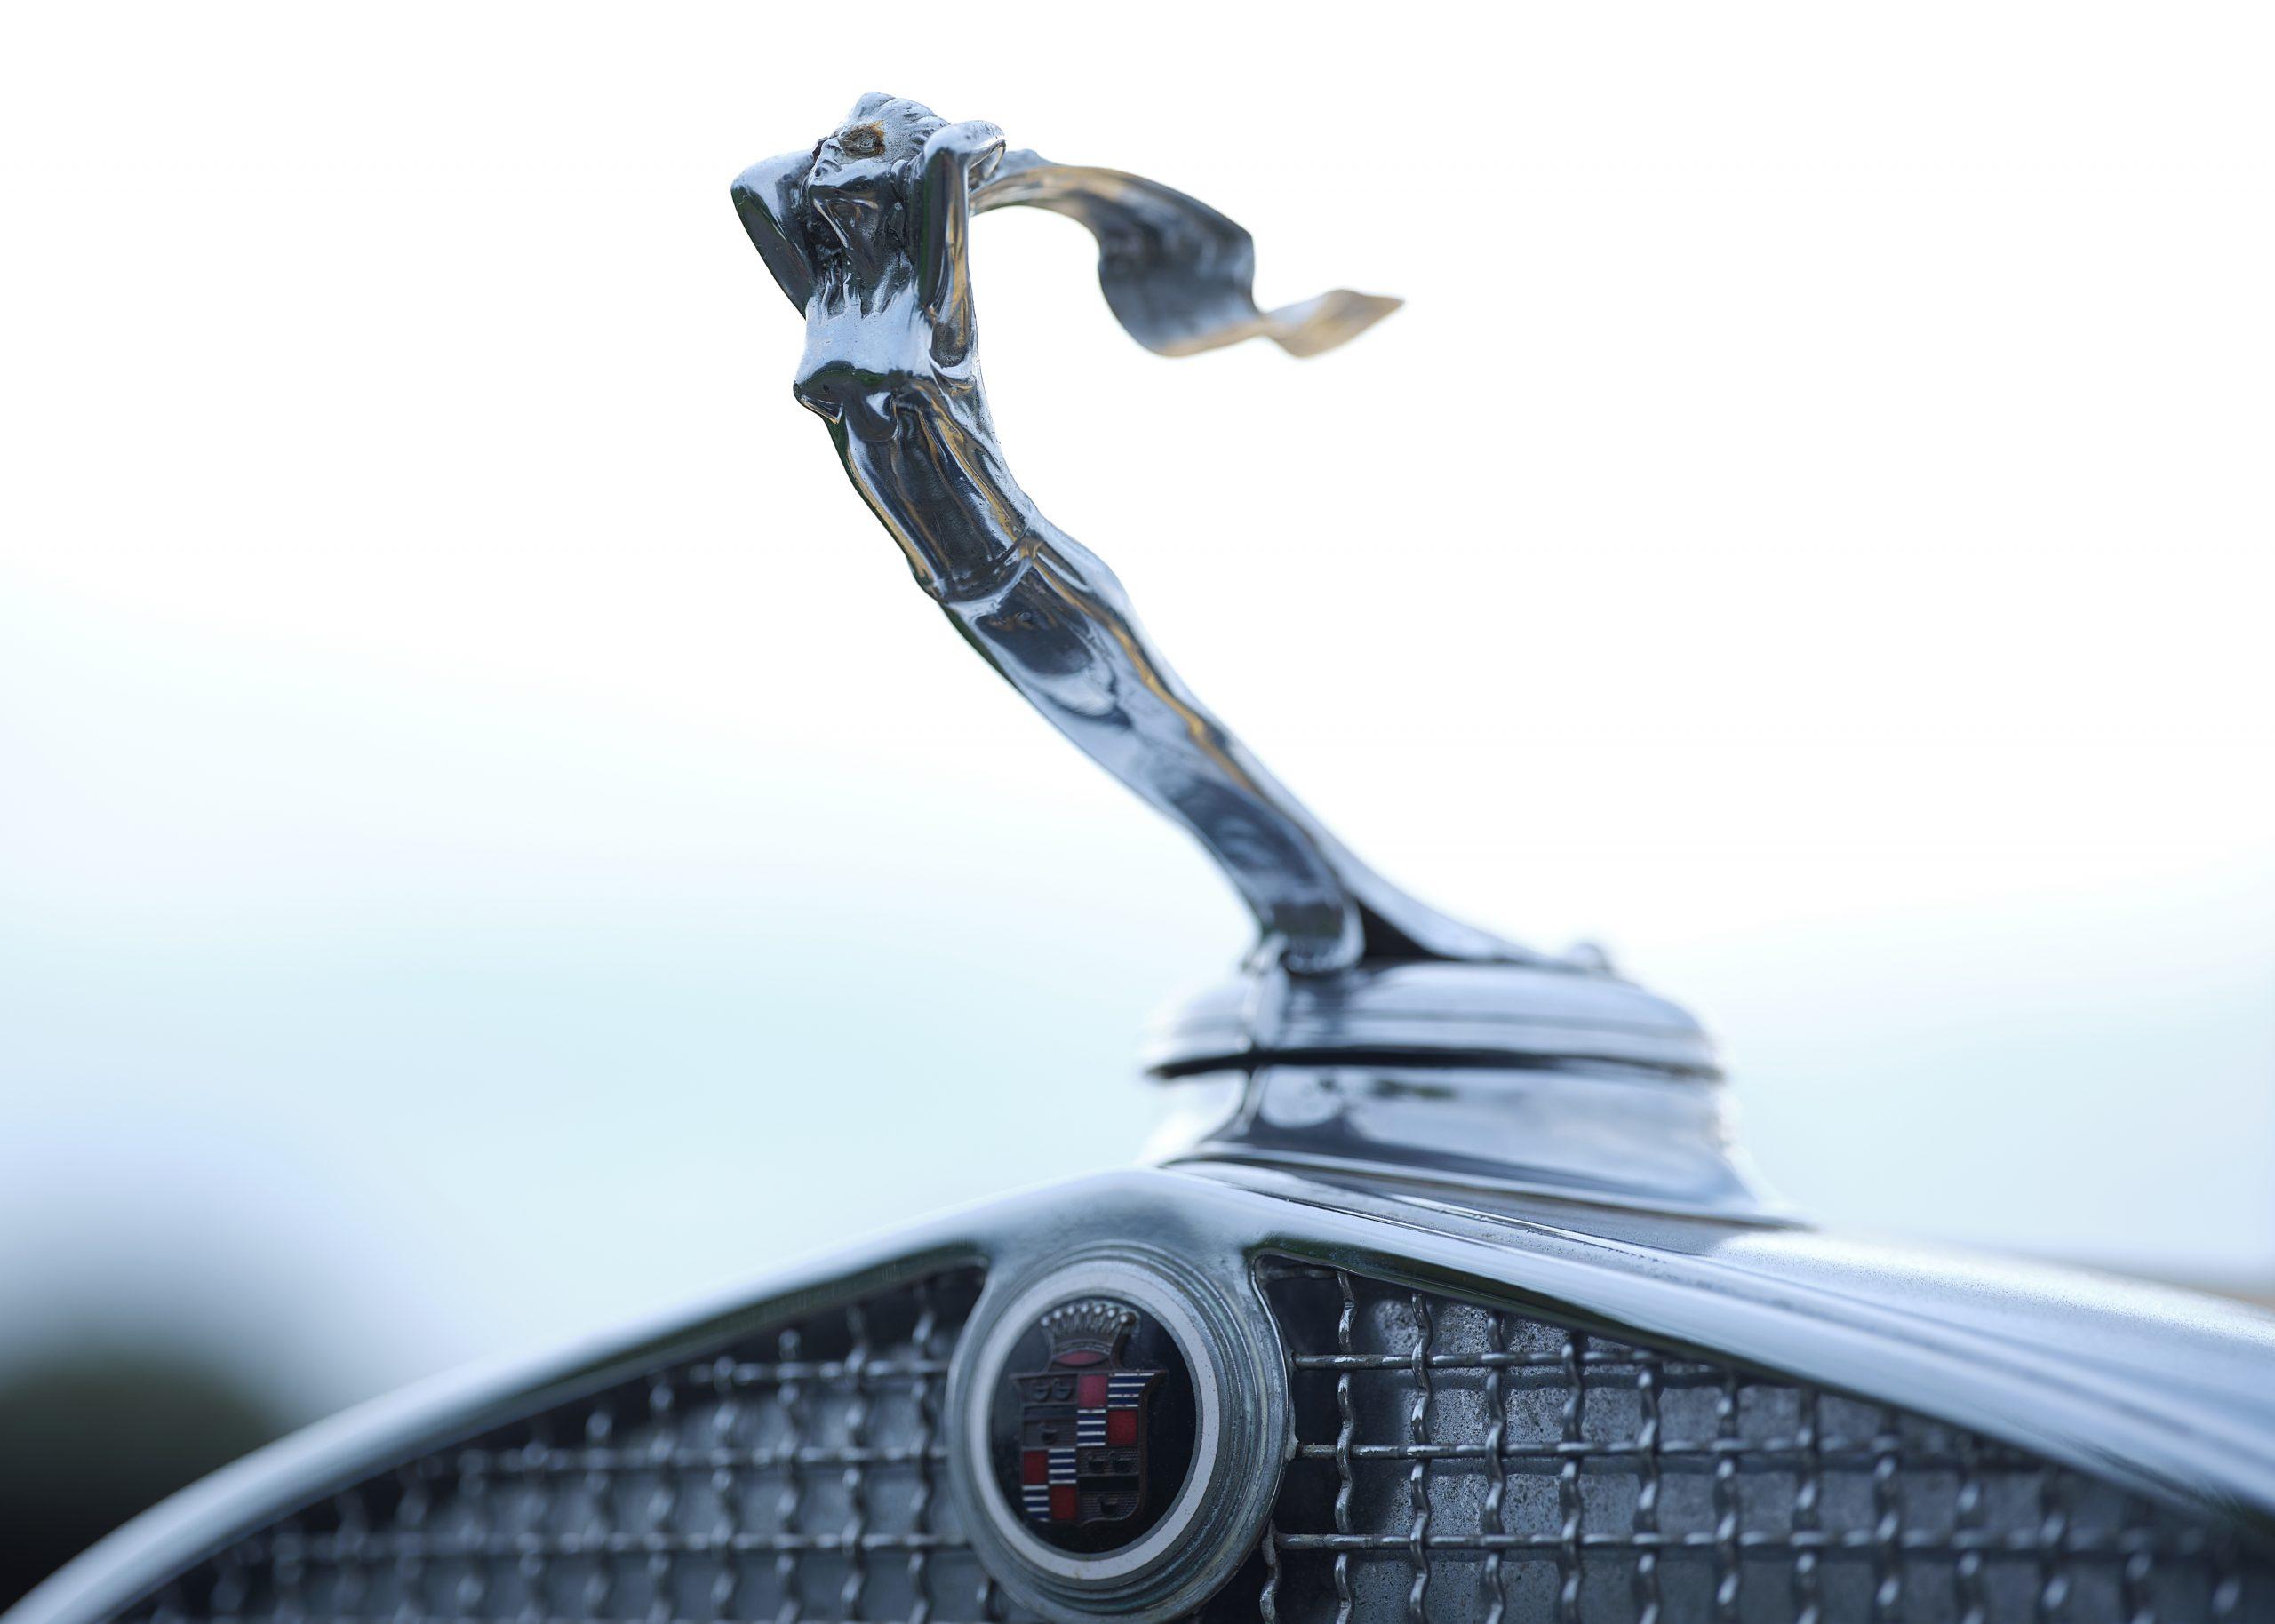 1931 Cadillac V-8 Convertible Coupe hood ornament